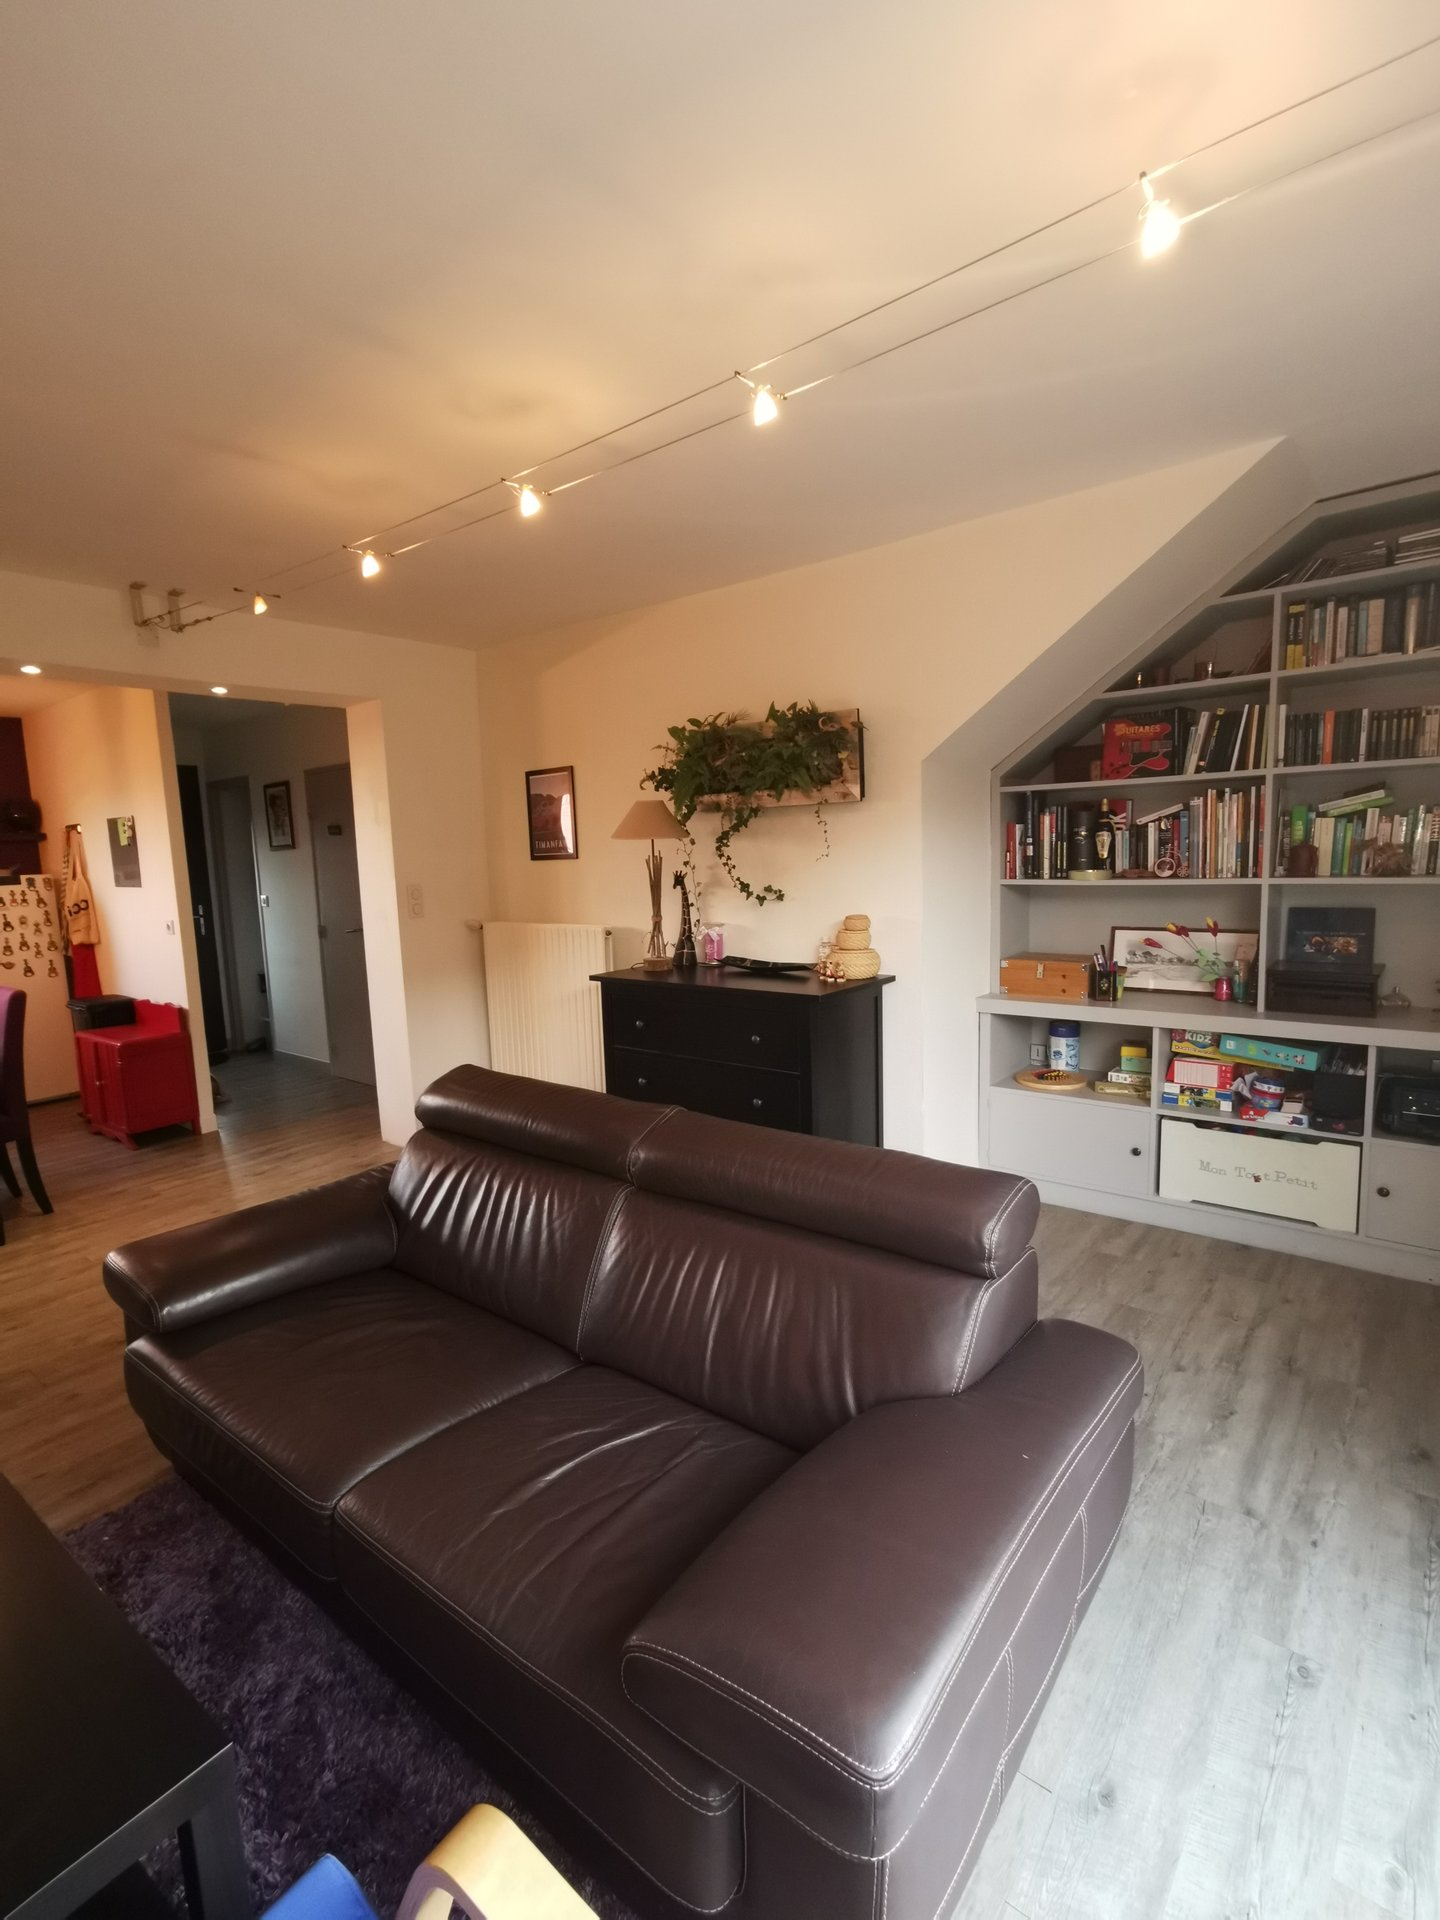 Venta Casa adosada - Brest Saint-Marc